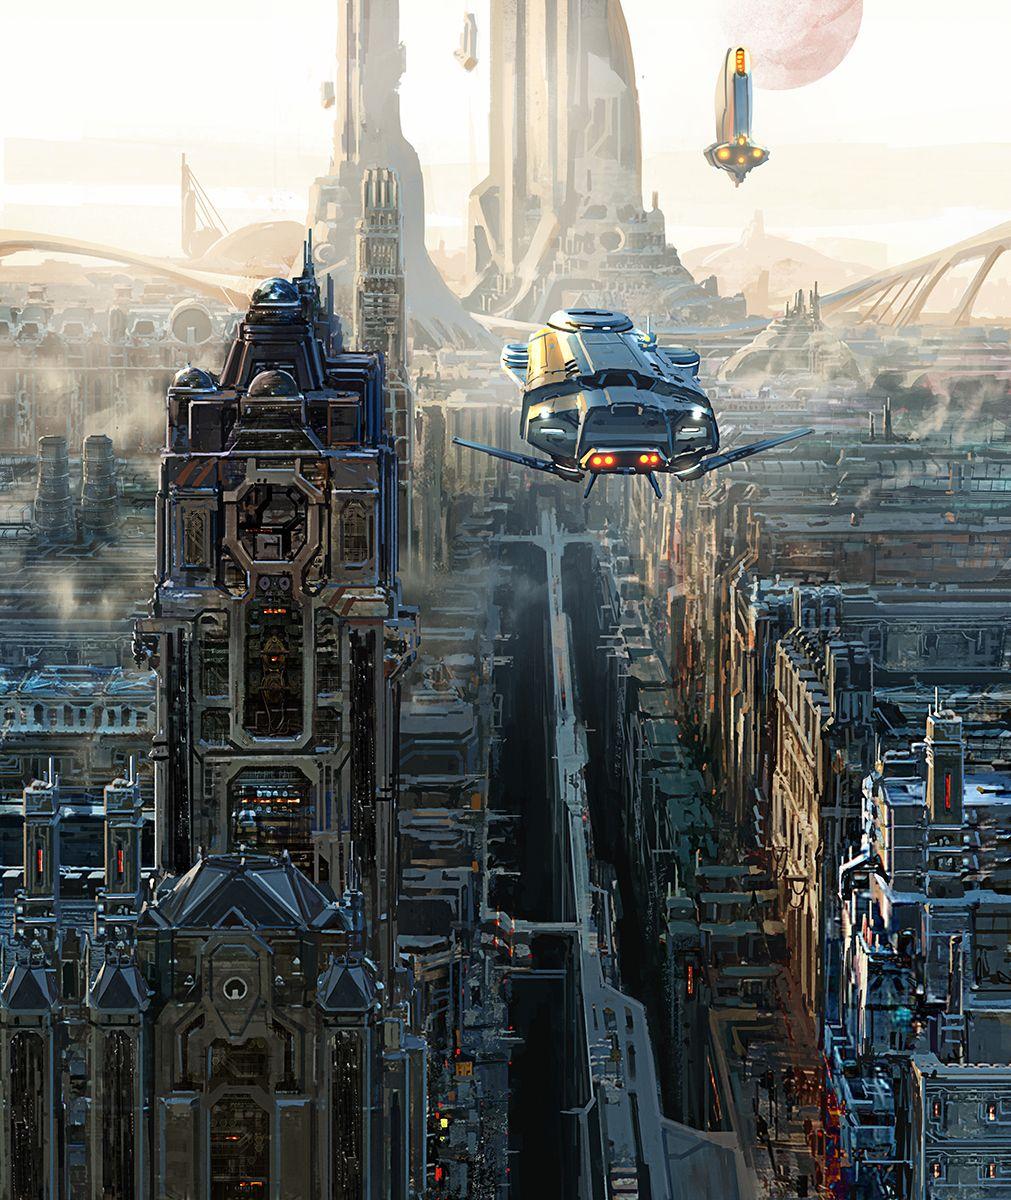 459 Best Retro Future Character Images On Pinterest: Pat Presley Sci-Fi Concept Artist